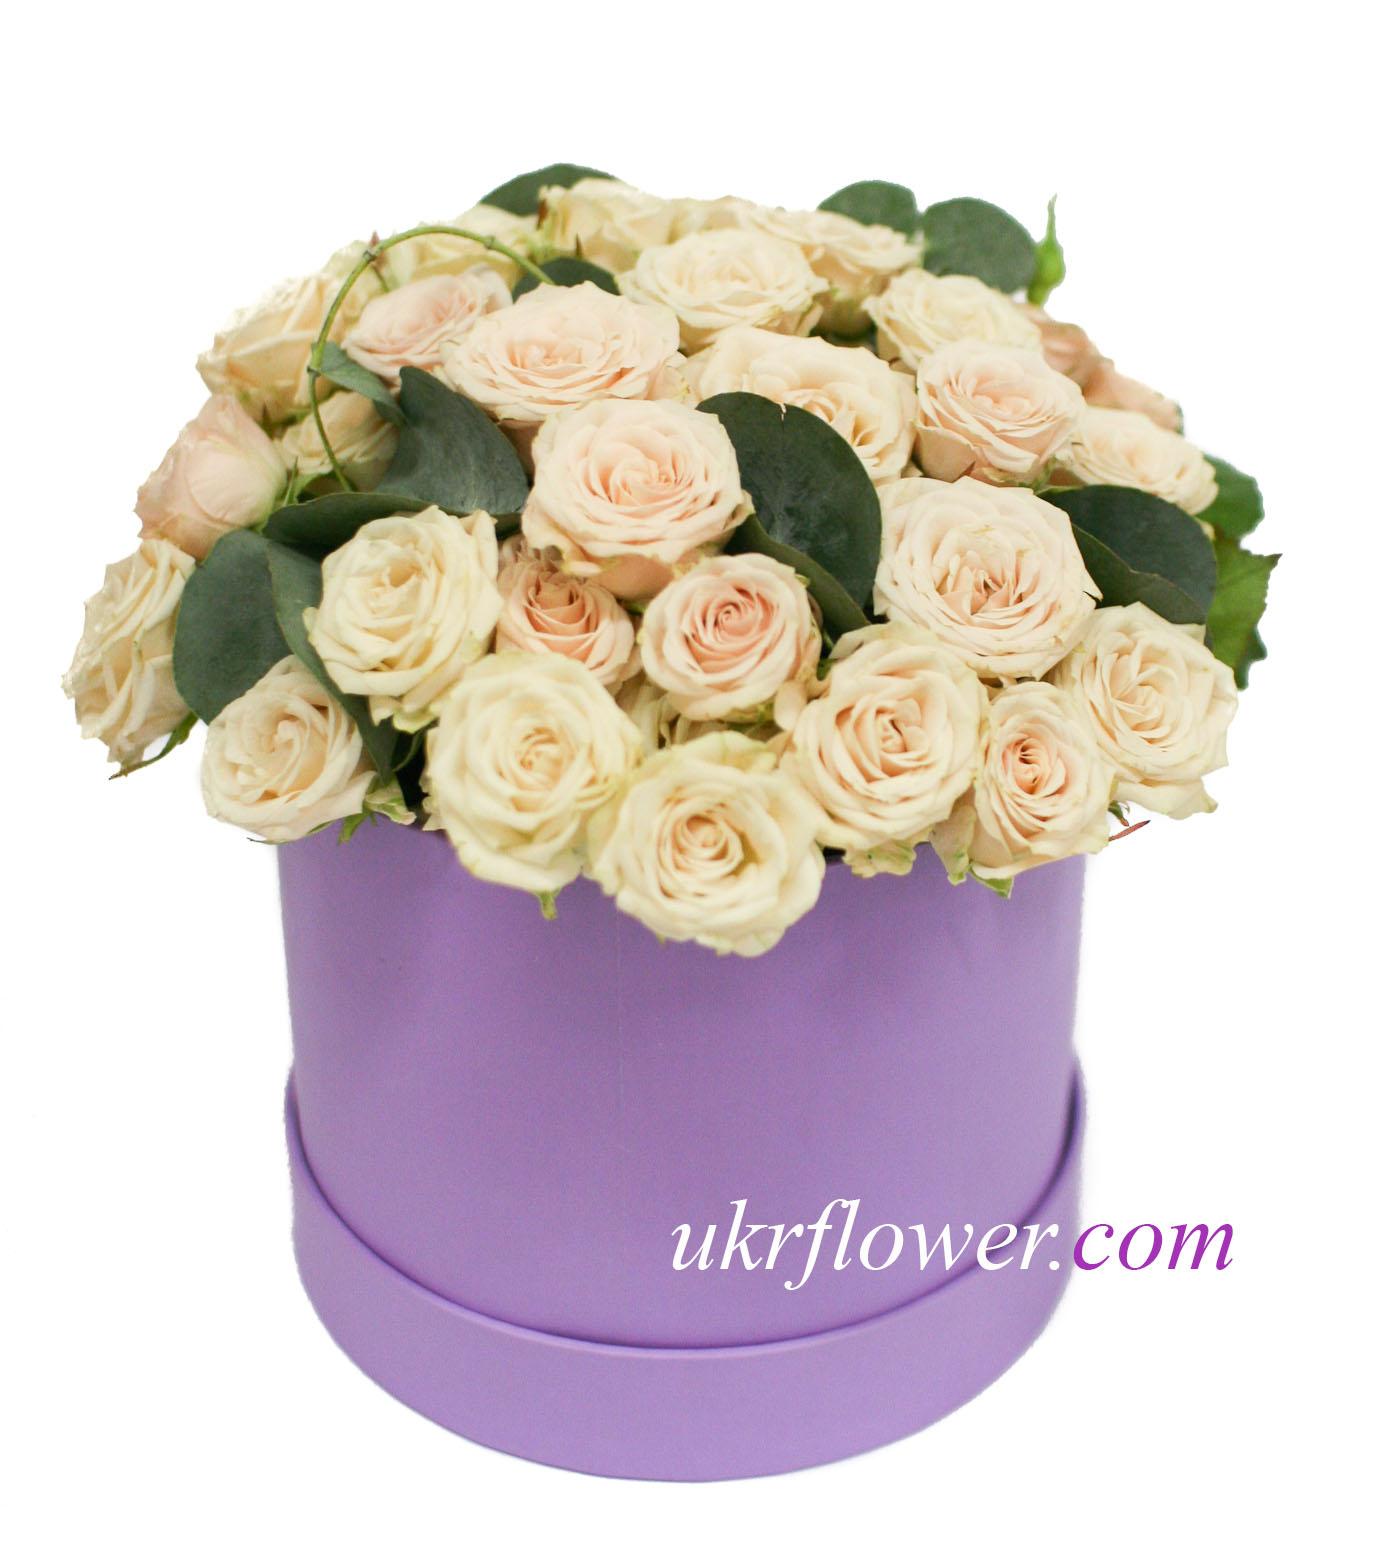 Spray Roses In The Box Ukrflower Flower Delivery Kiev Ukraine